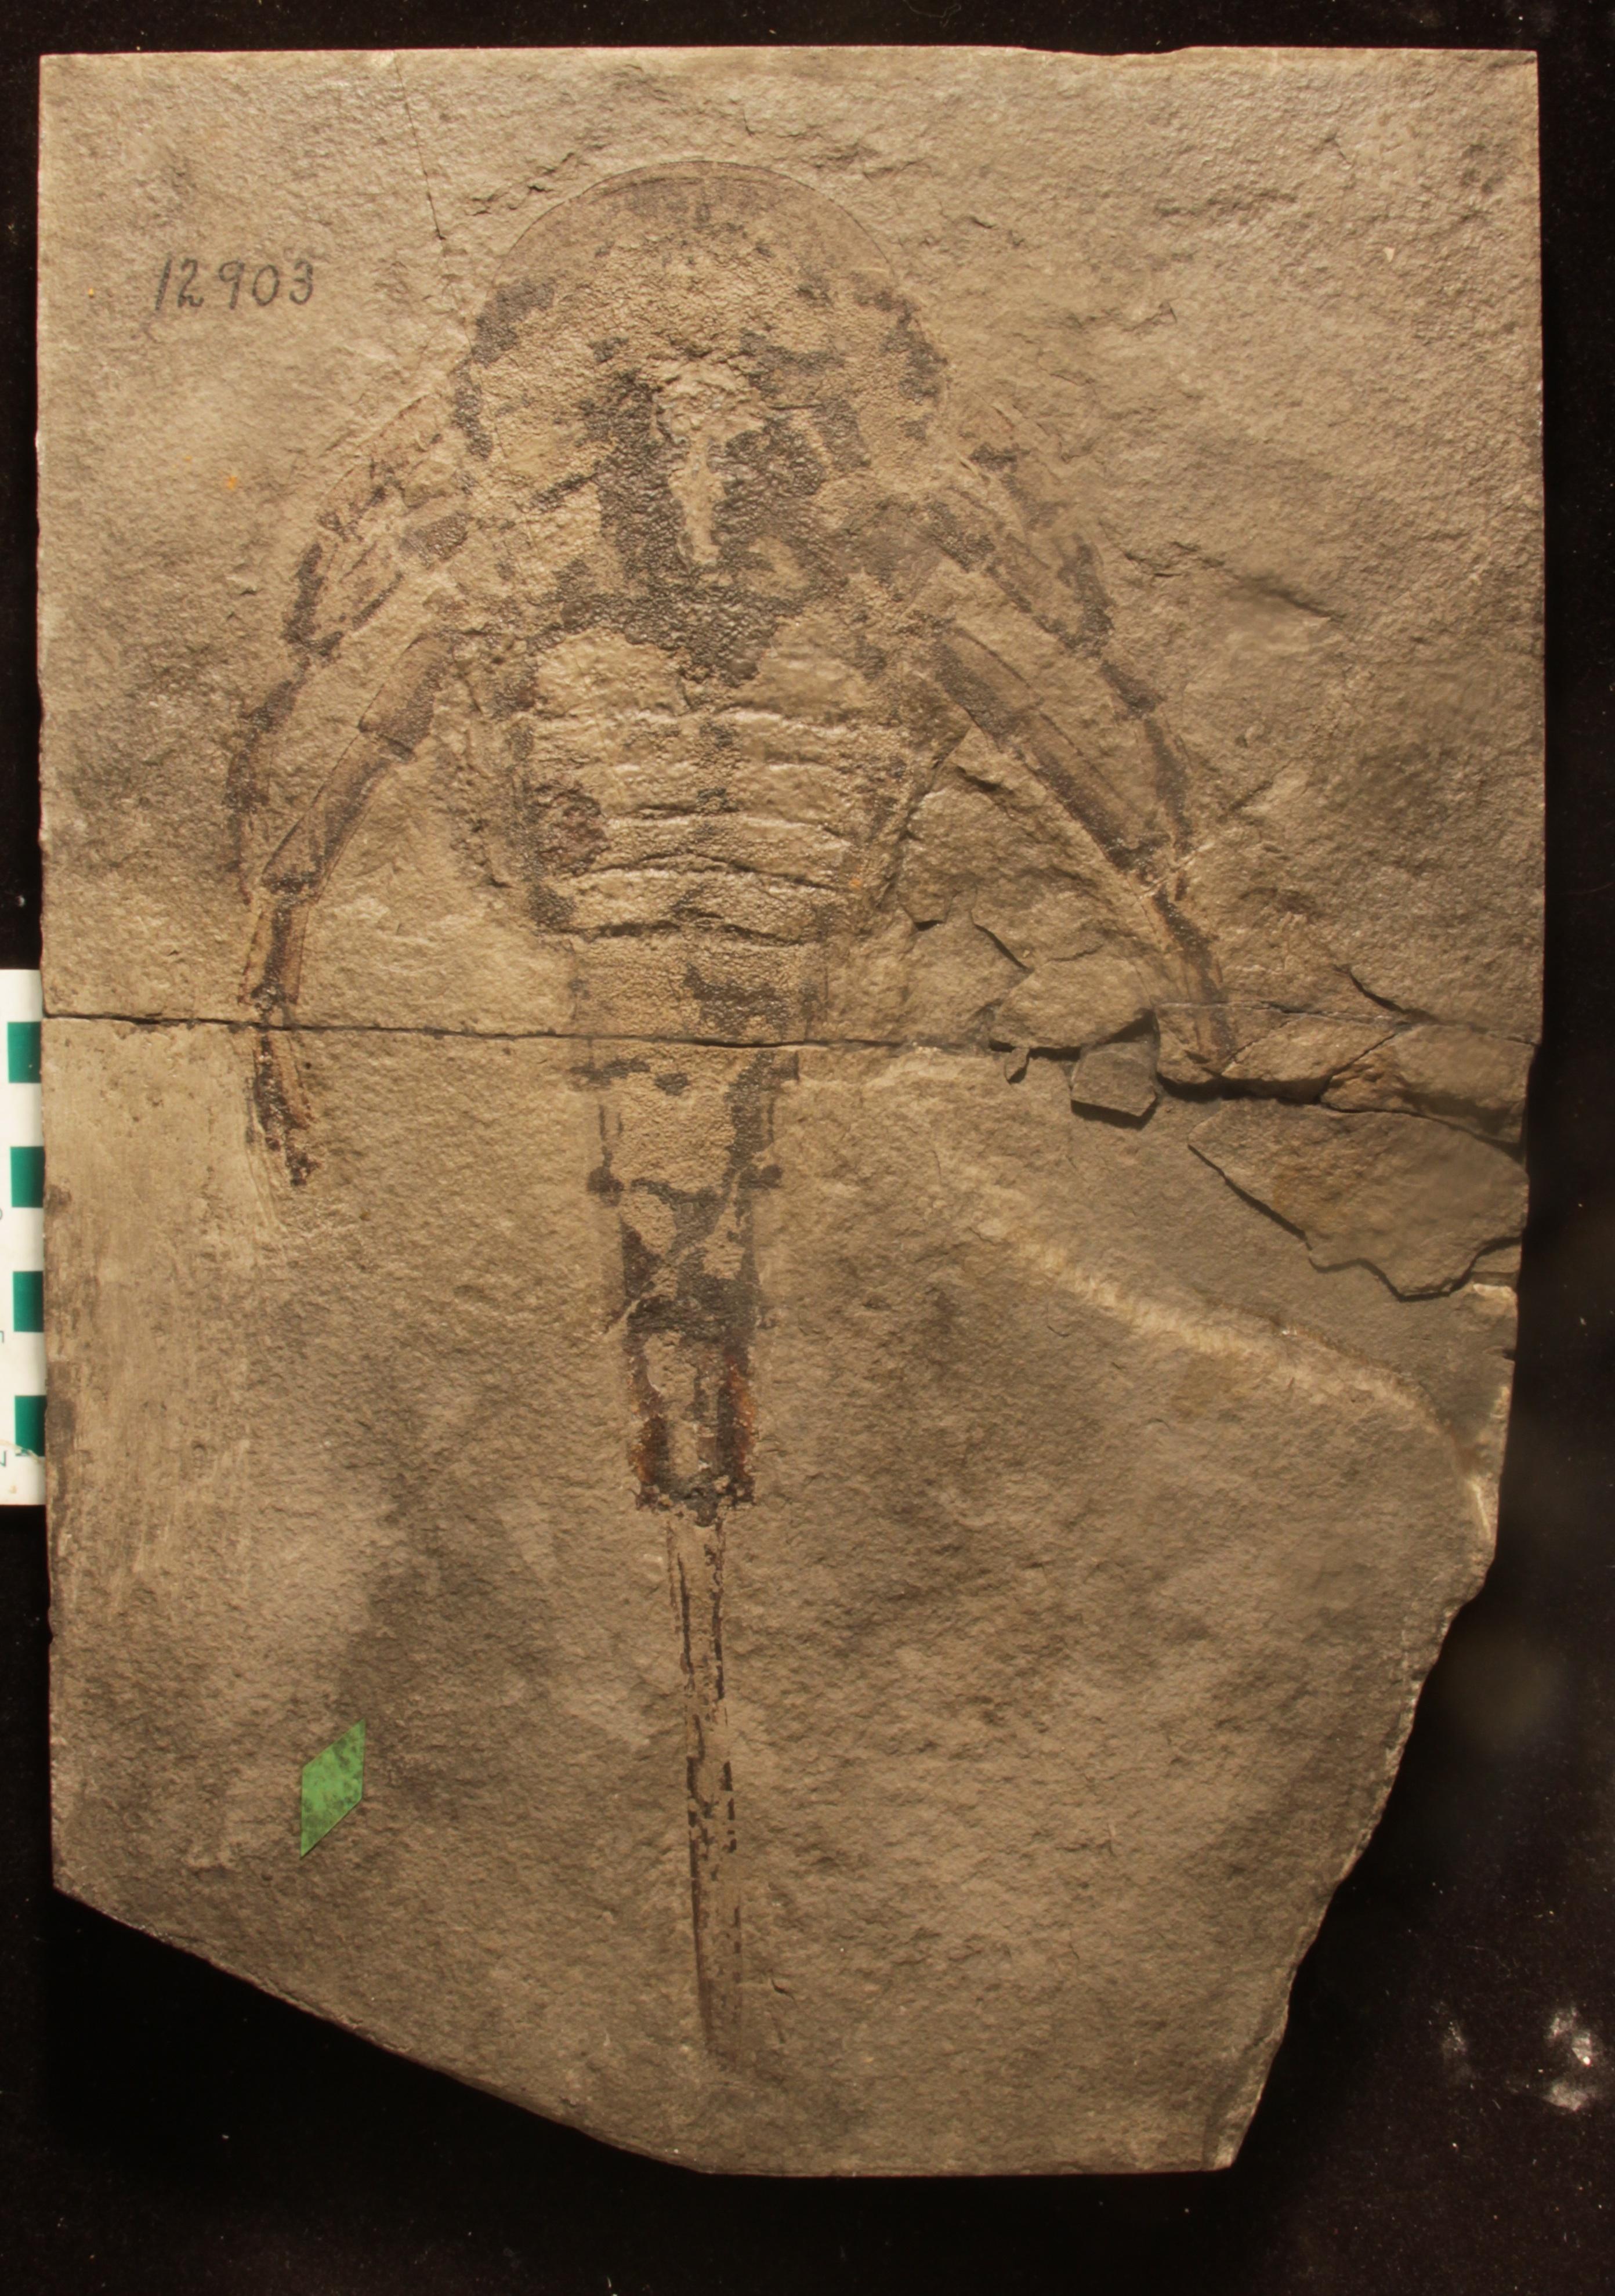 A eurypterid (sea scorpion) Silurian fossil from Kokomo, Indiana.